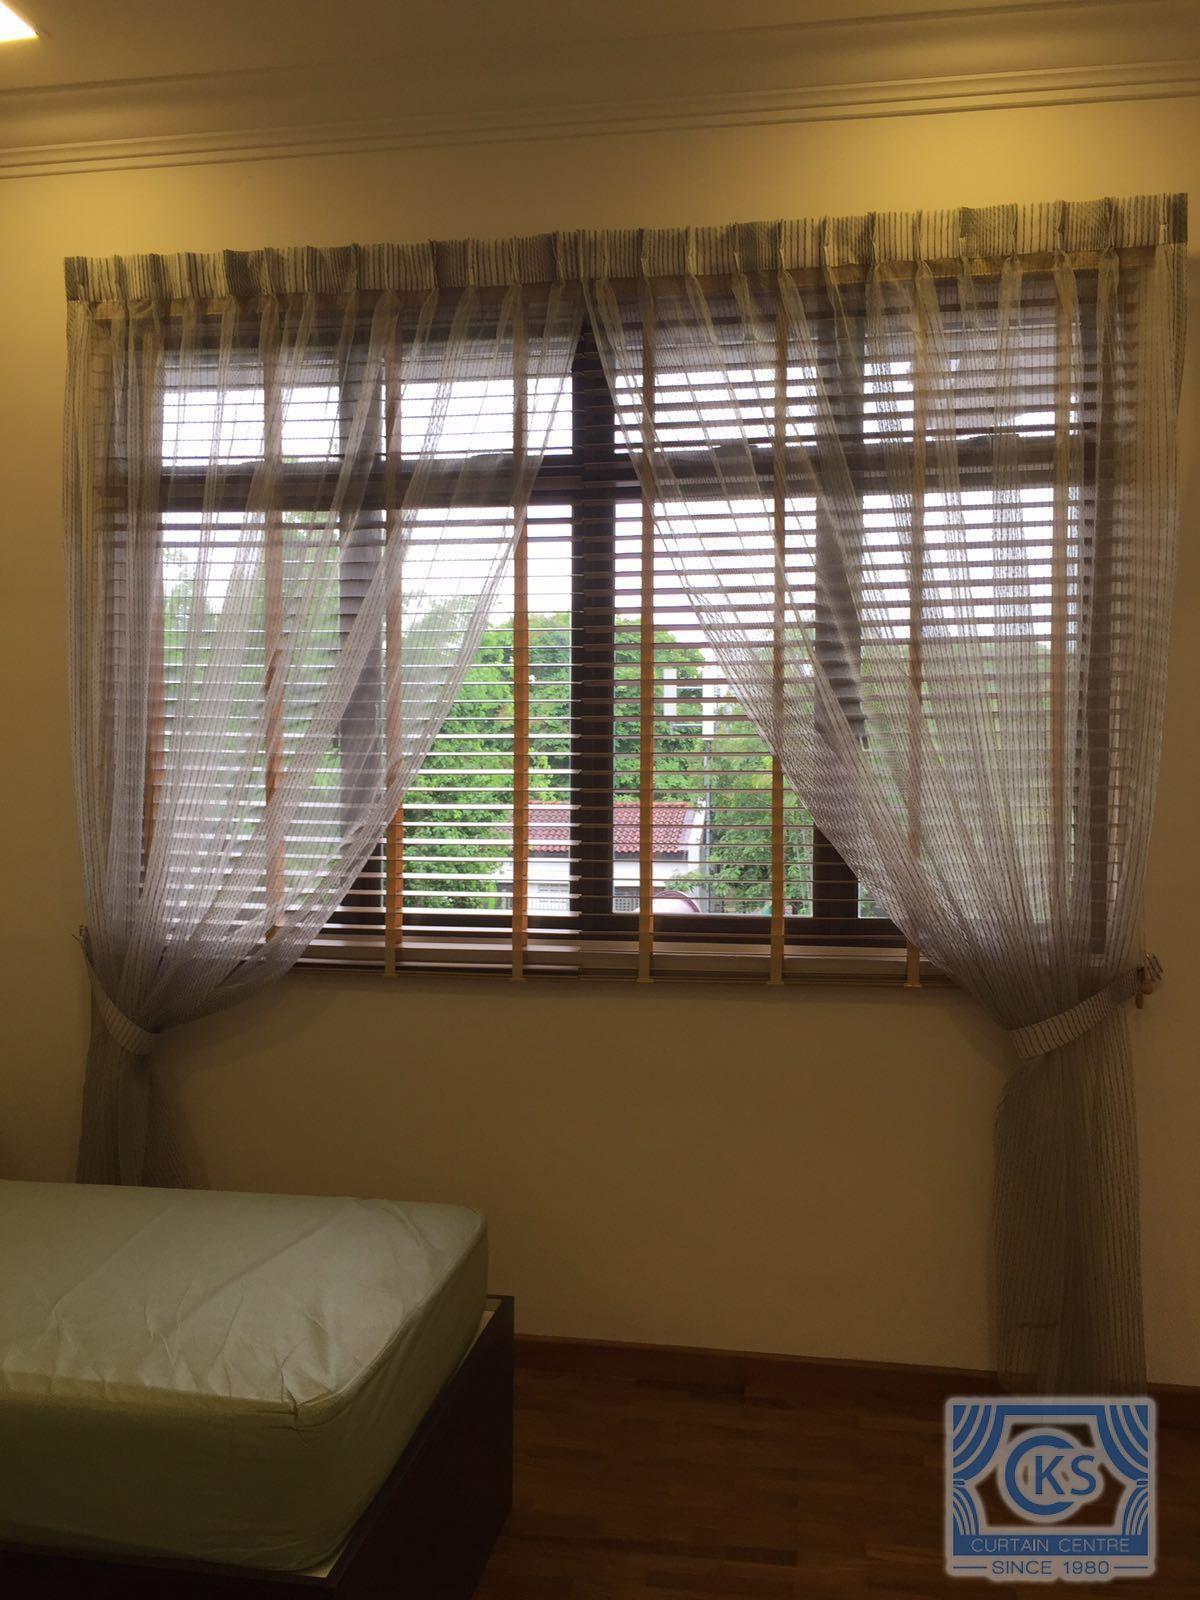 Window blind u curtain centre realtagfo pinterest